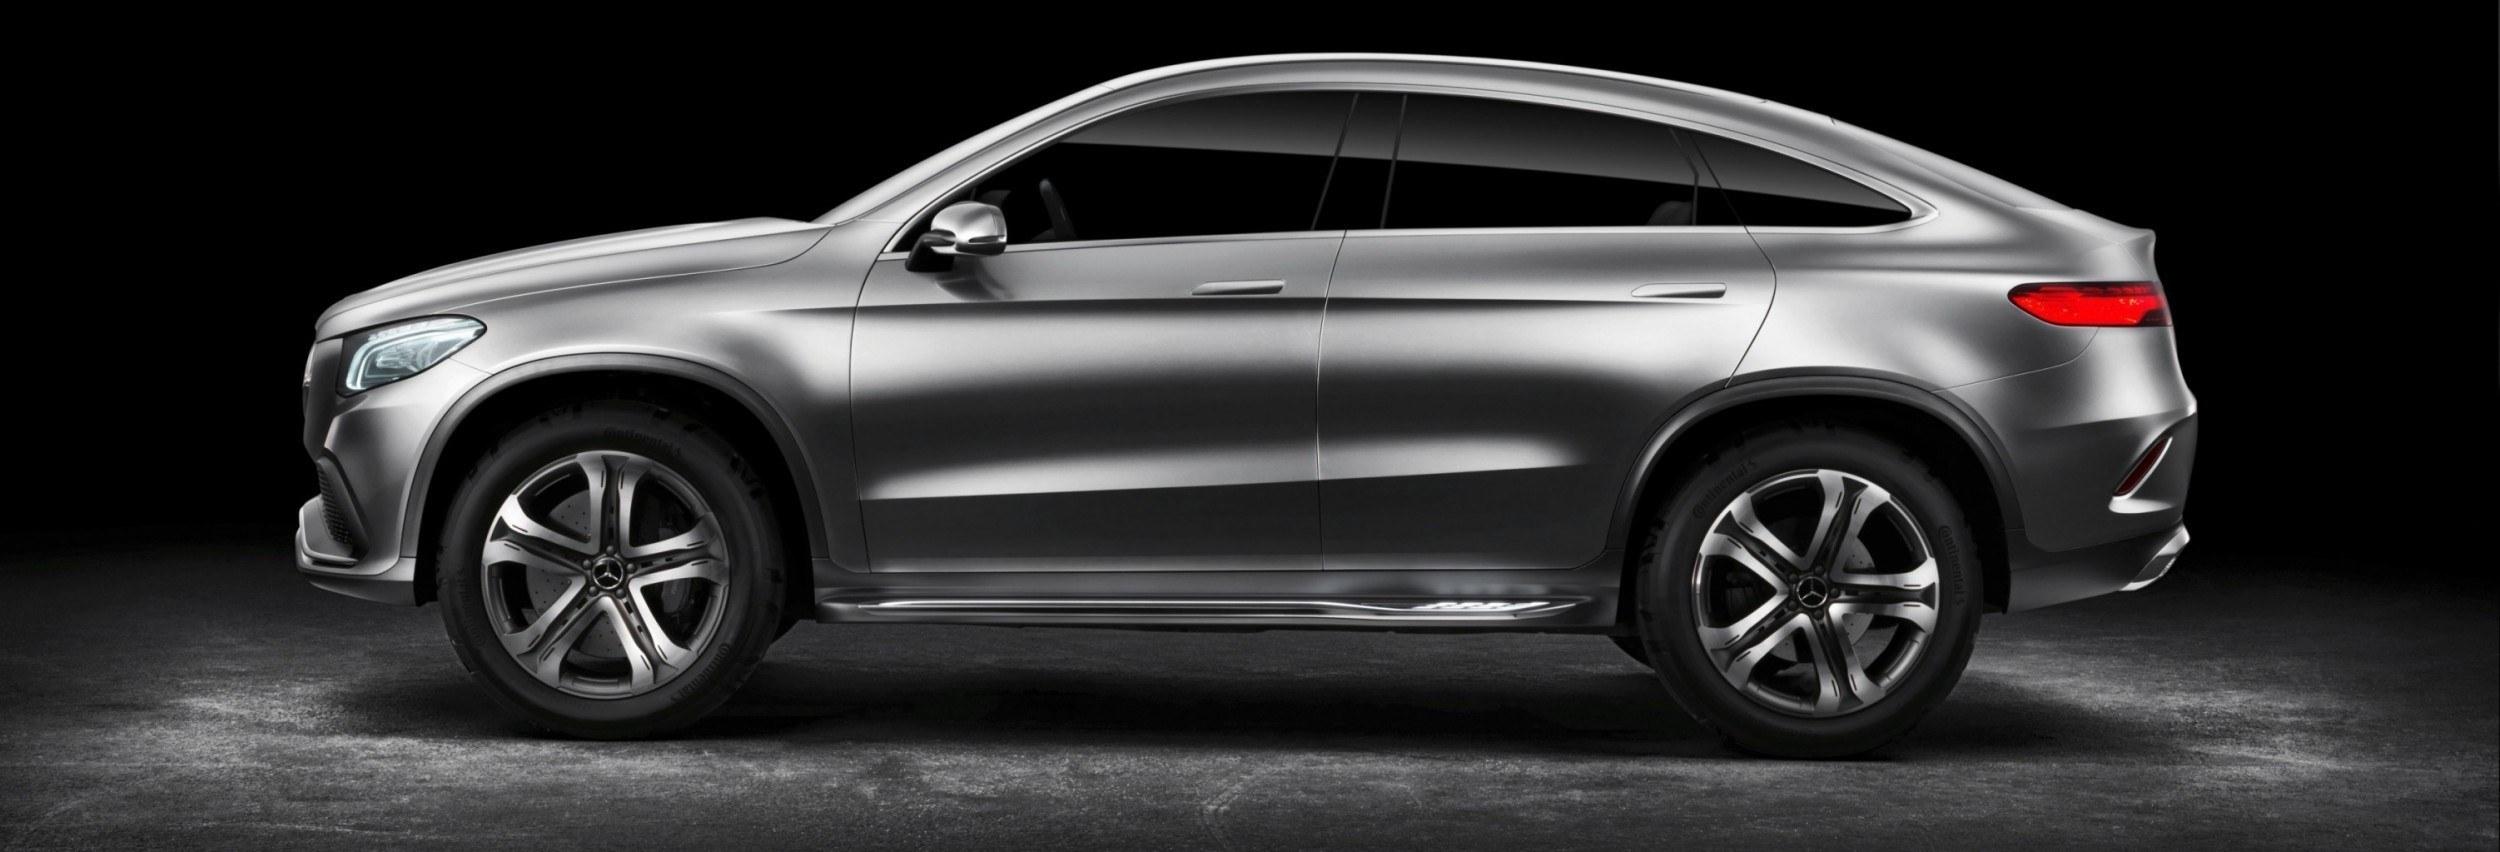 official details below from mercedes benz - Mercedes Benz Suv 2014 White